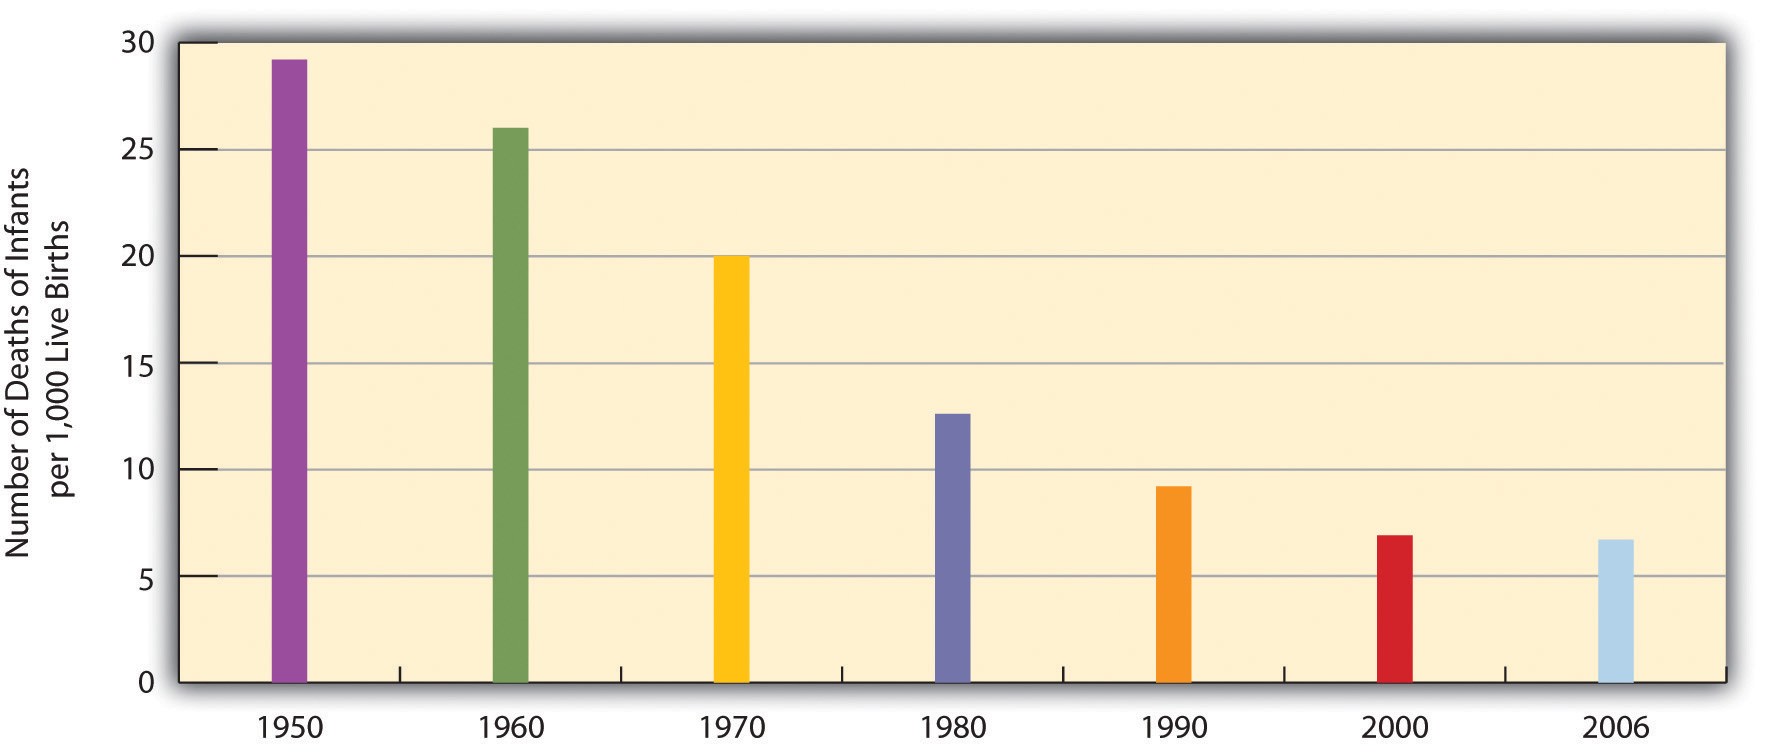 Infant Deaths per 1,000 Live Births, United States, 1950-2006